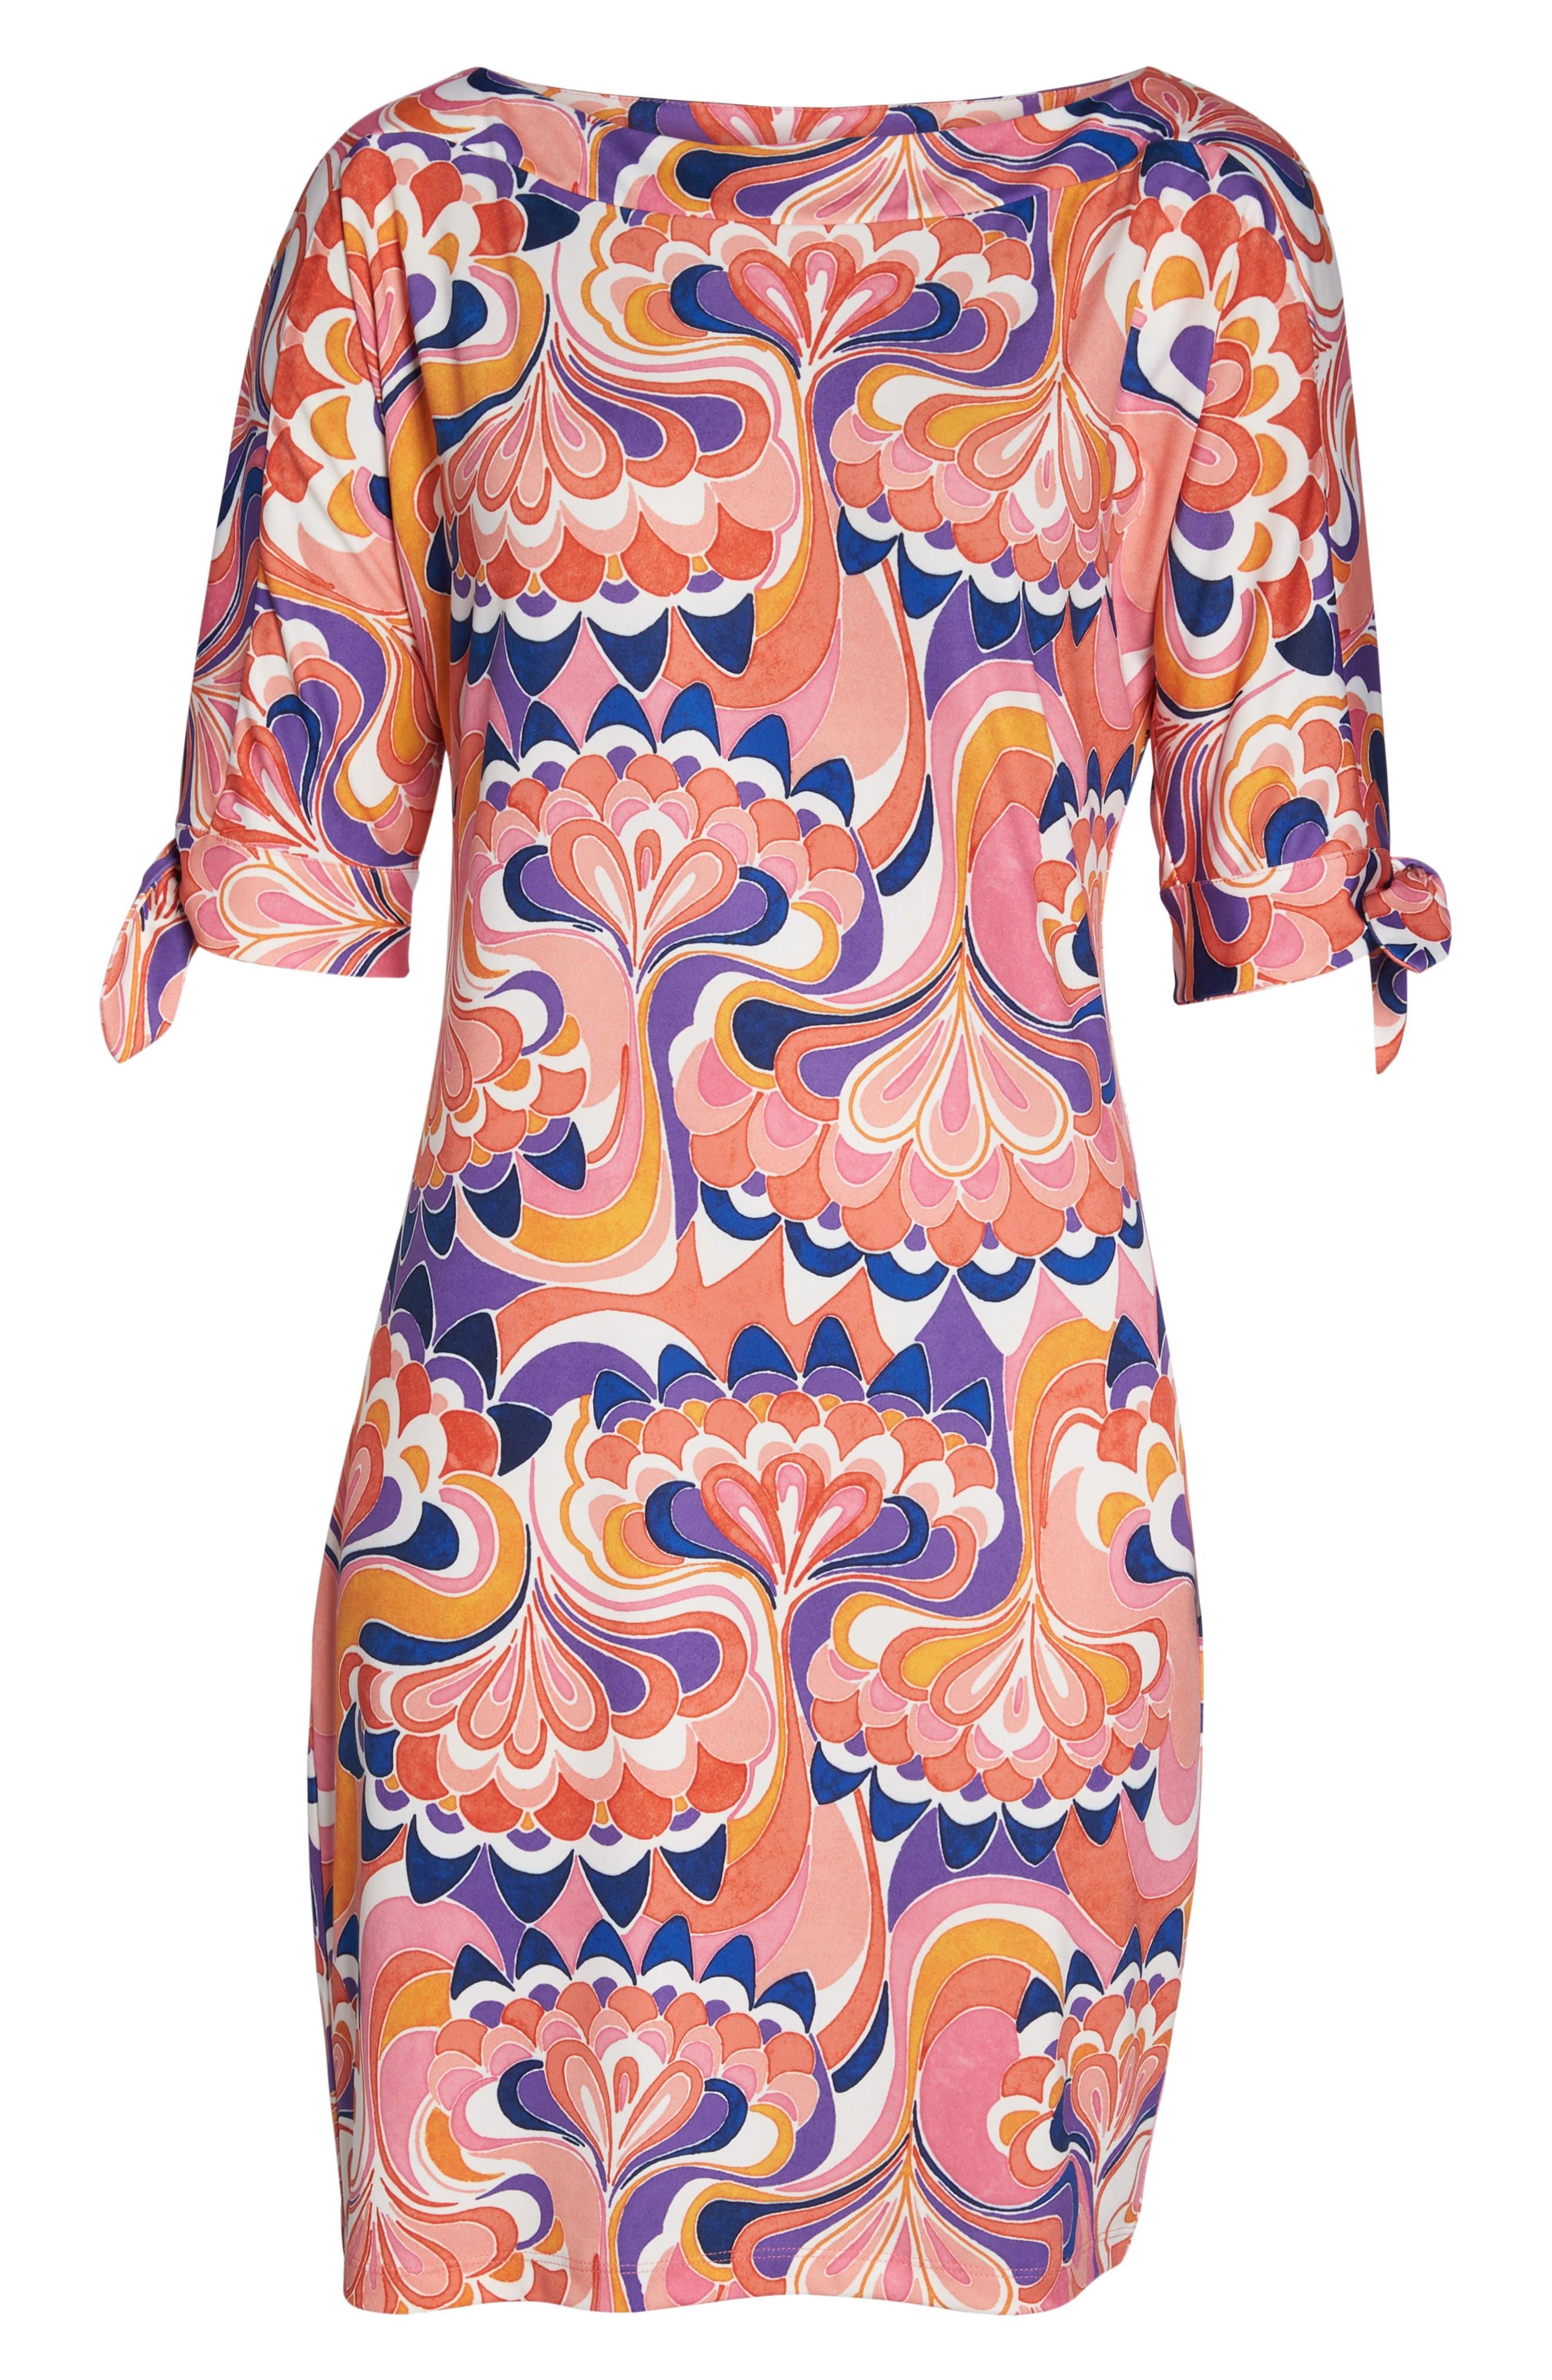 Vinet Floral Jersey Dress,                             Alternate thumbnail 12, color,